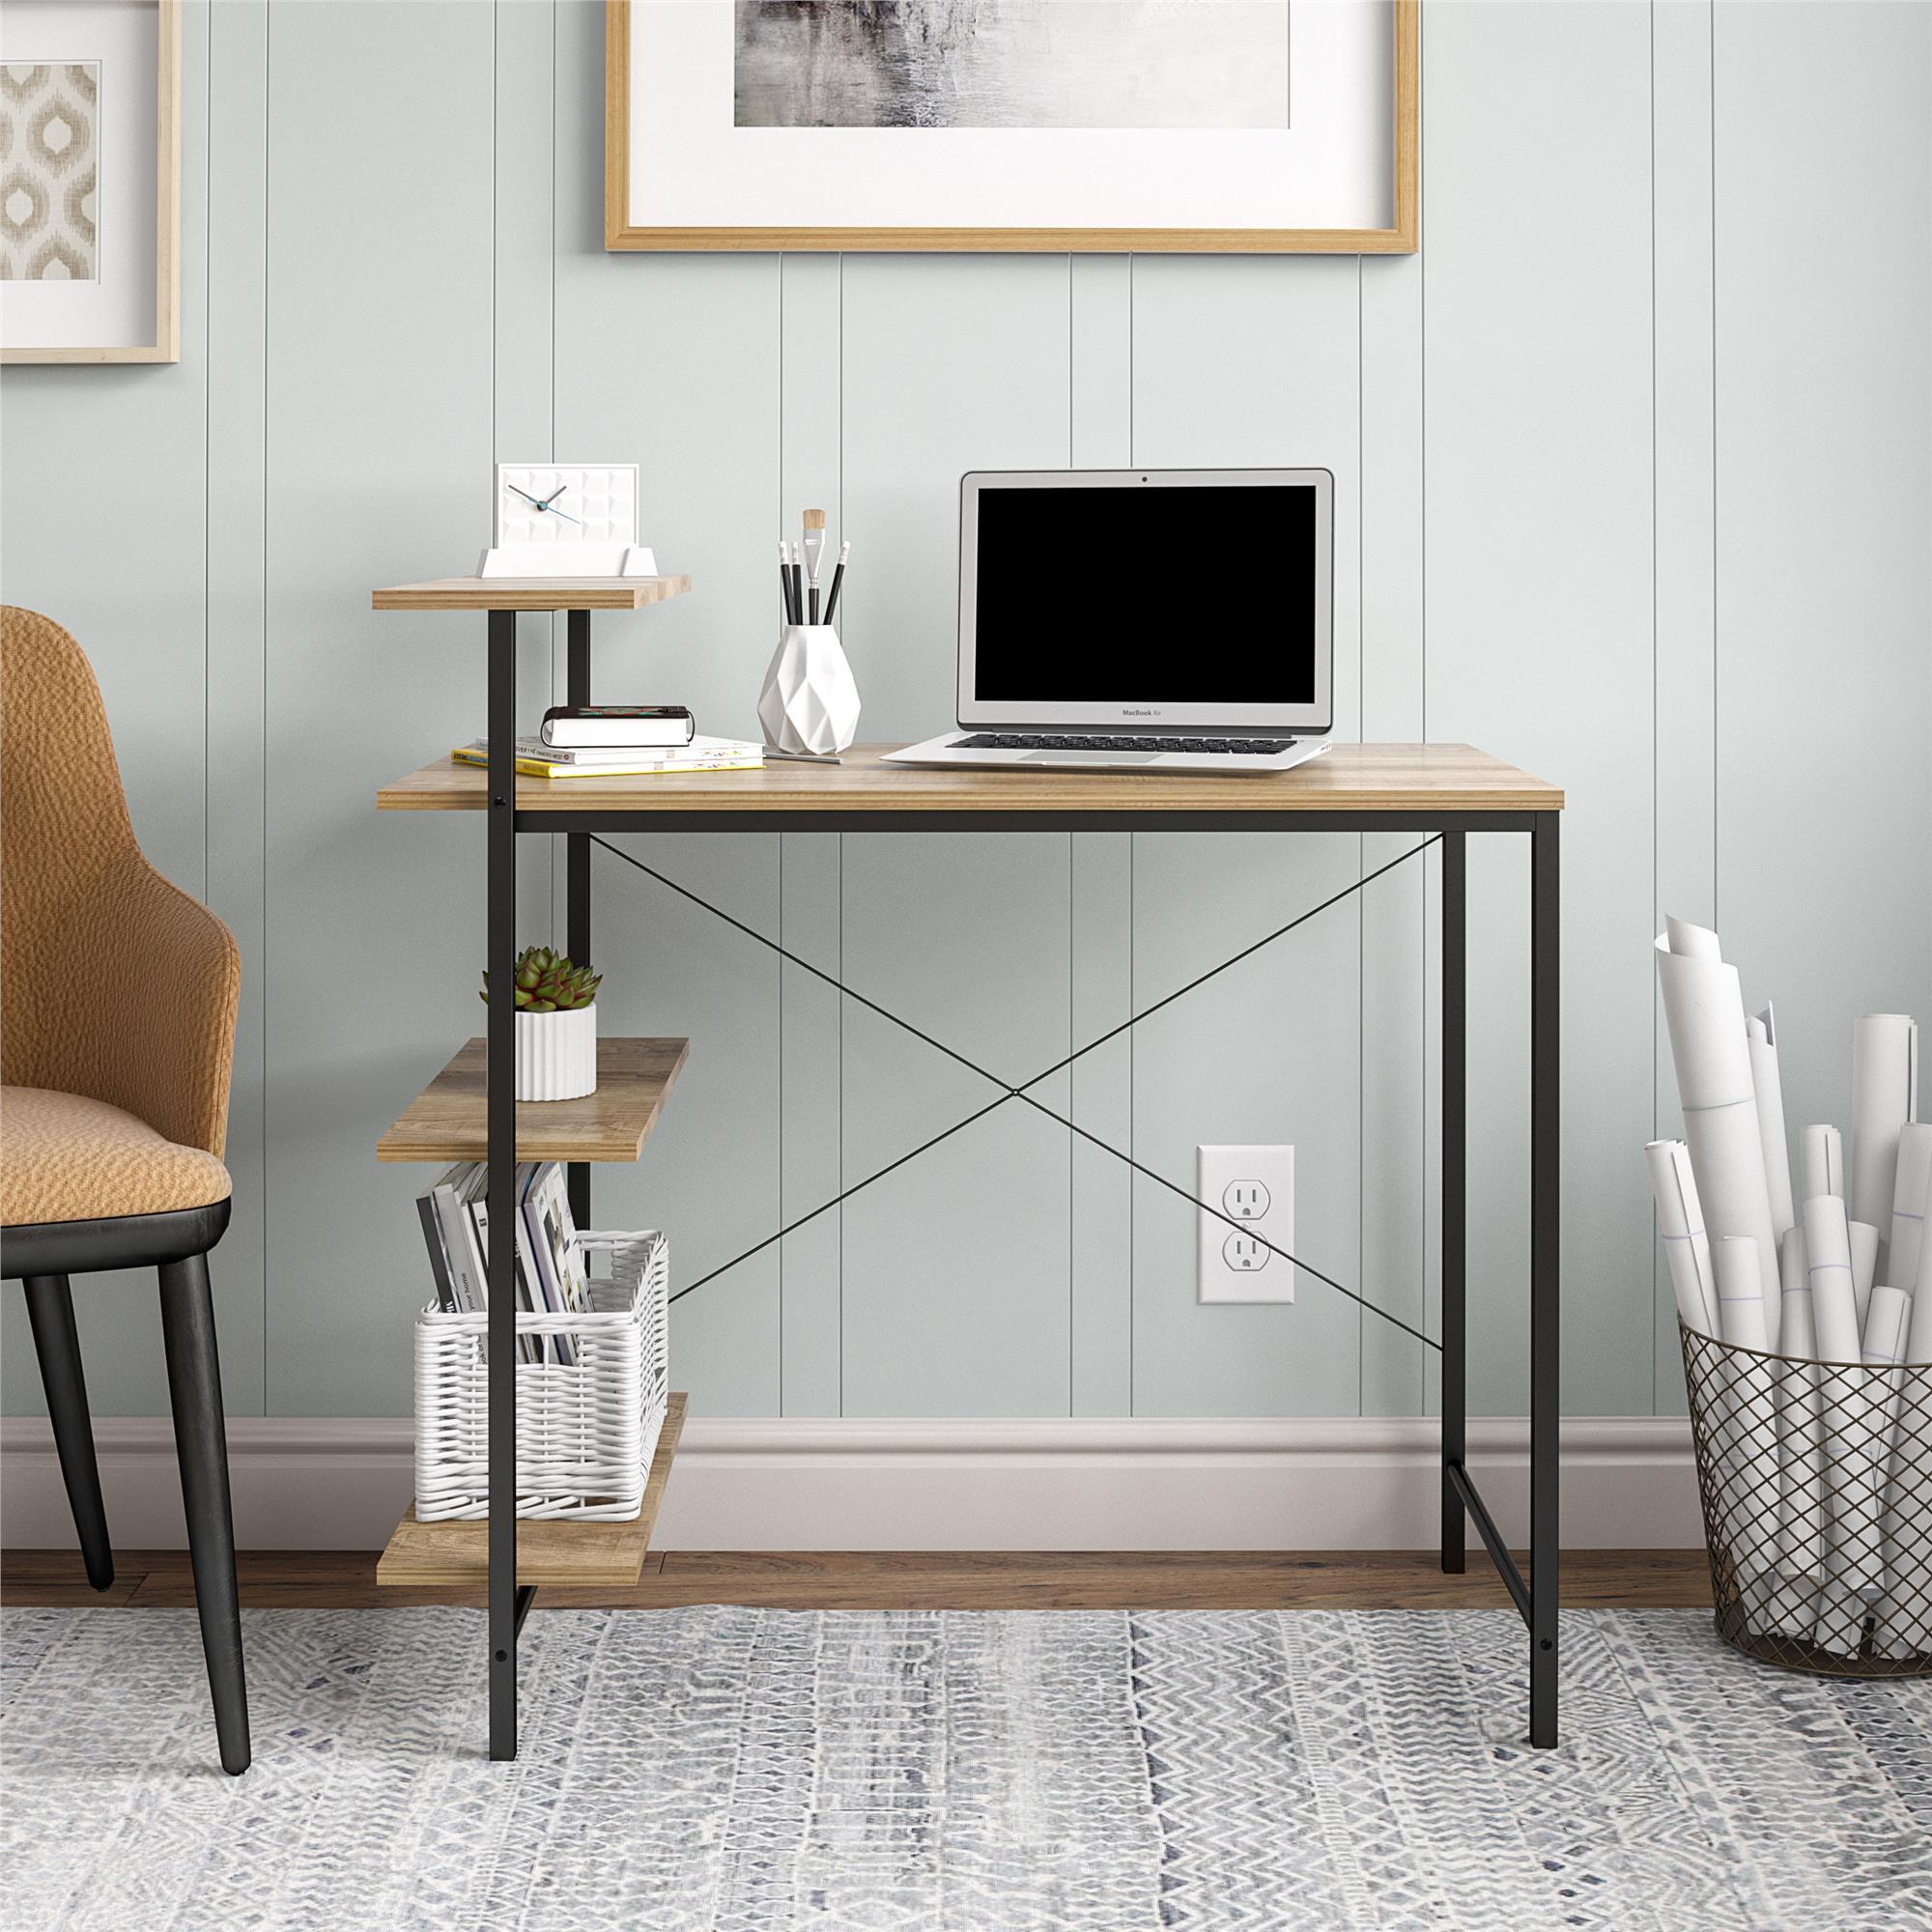 Mainstays Side Storage Desk (Golden Oak) $40 + Free Shipping